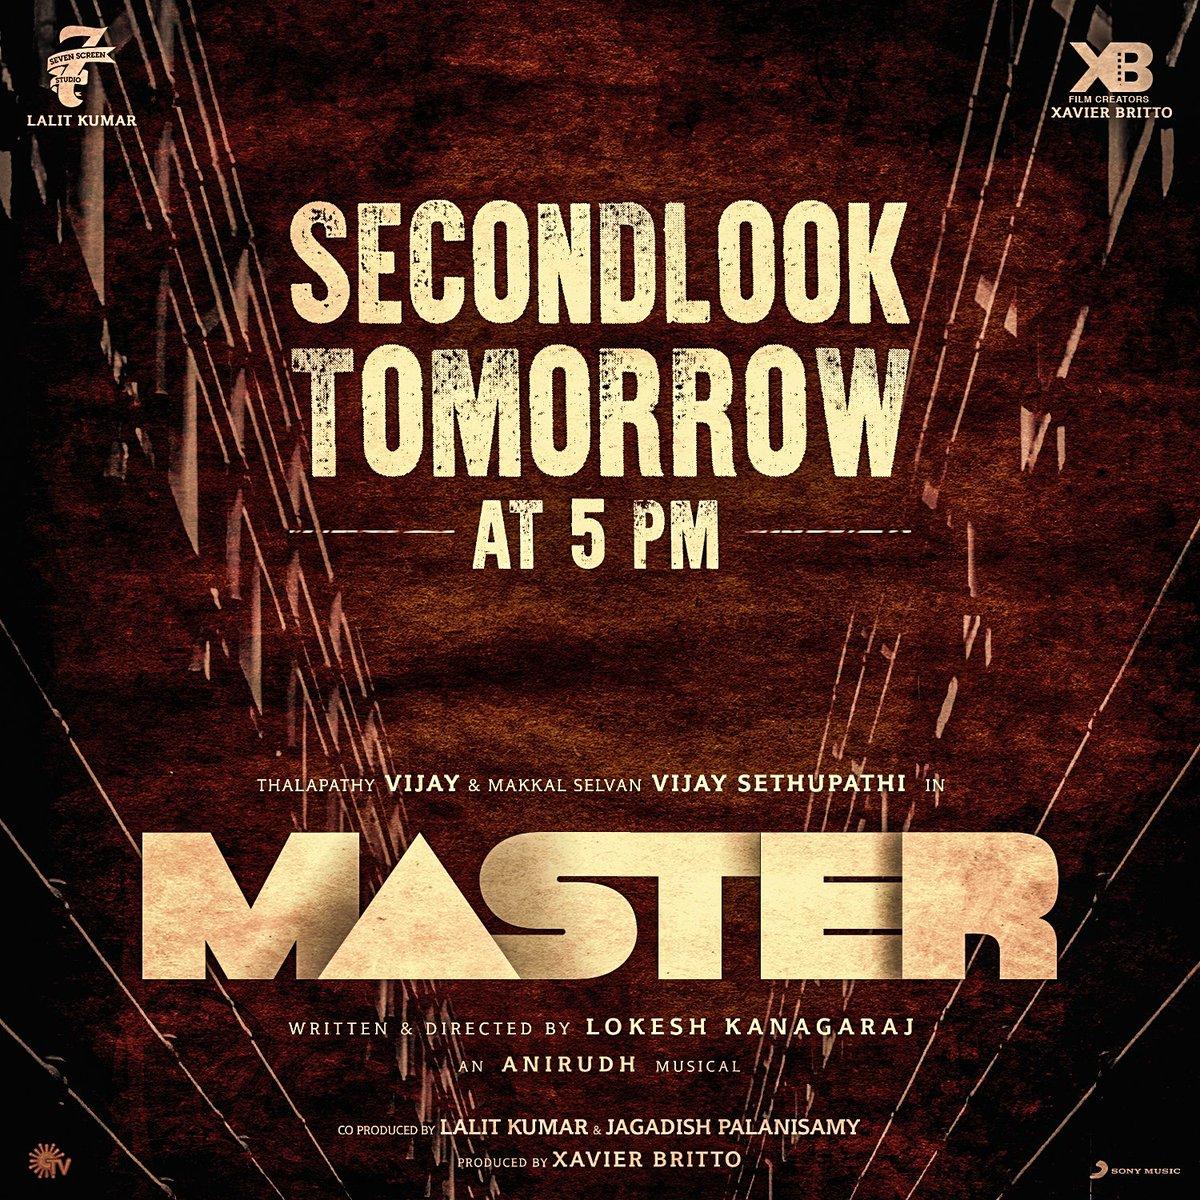 Indha pongal namaku semma treat ma! 😎🔥Revealing the second look poster of #Master tomorrow at 5 pm. Gear up for #MasterPongal #MasterHasArrived #MasterUpdate@actorvijay @VijaySethuOffl @Dir_Lokesh @anirudhofficial @jagadishbliss @Lalit_sevenscr @imKBRshanthnu @MalavikaM_